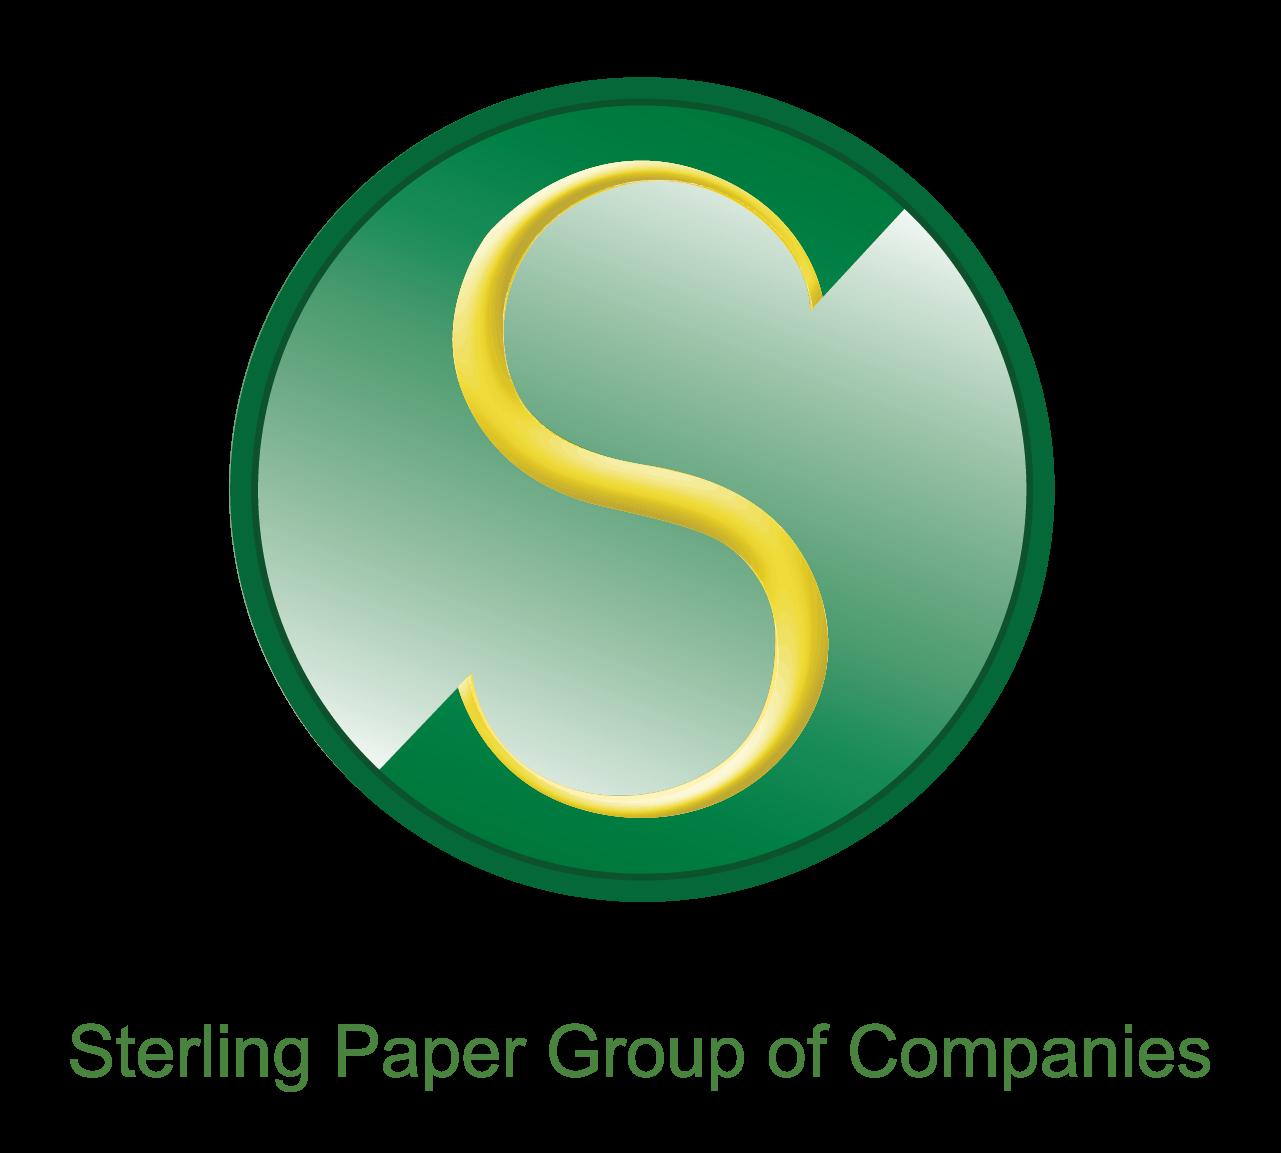 ice plant business plan philippines makati